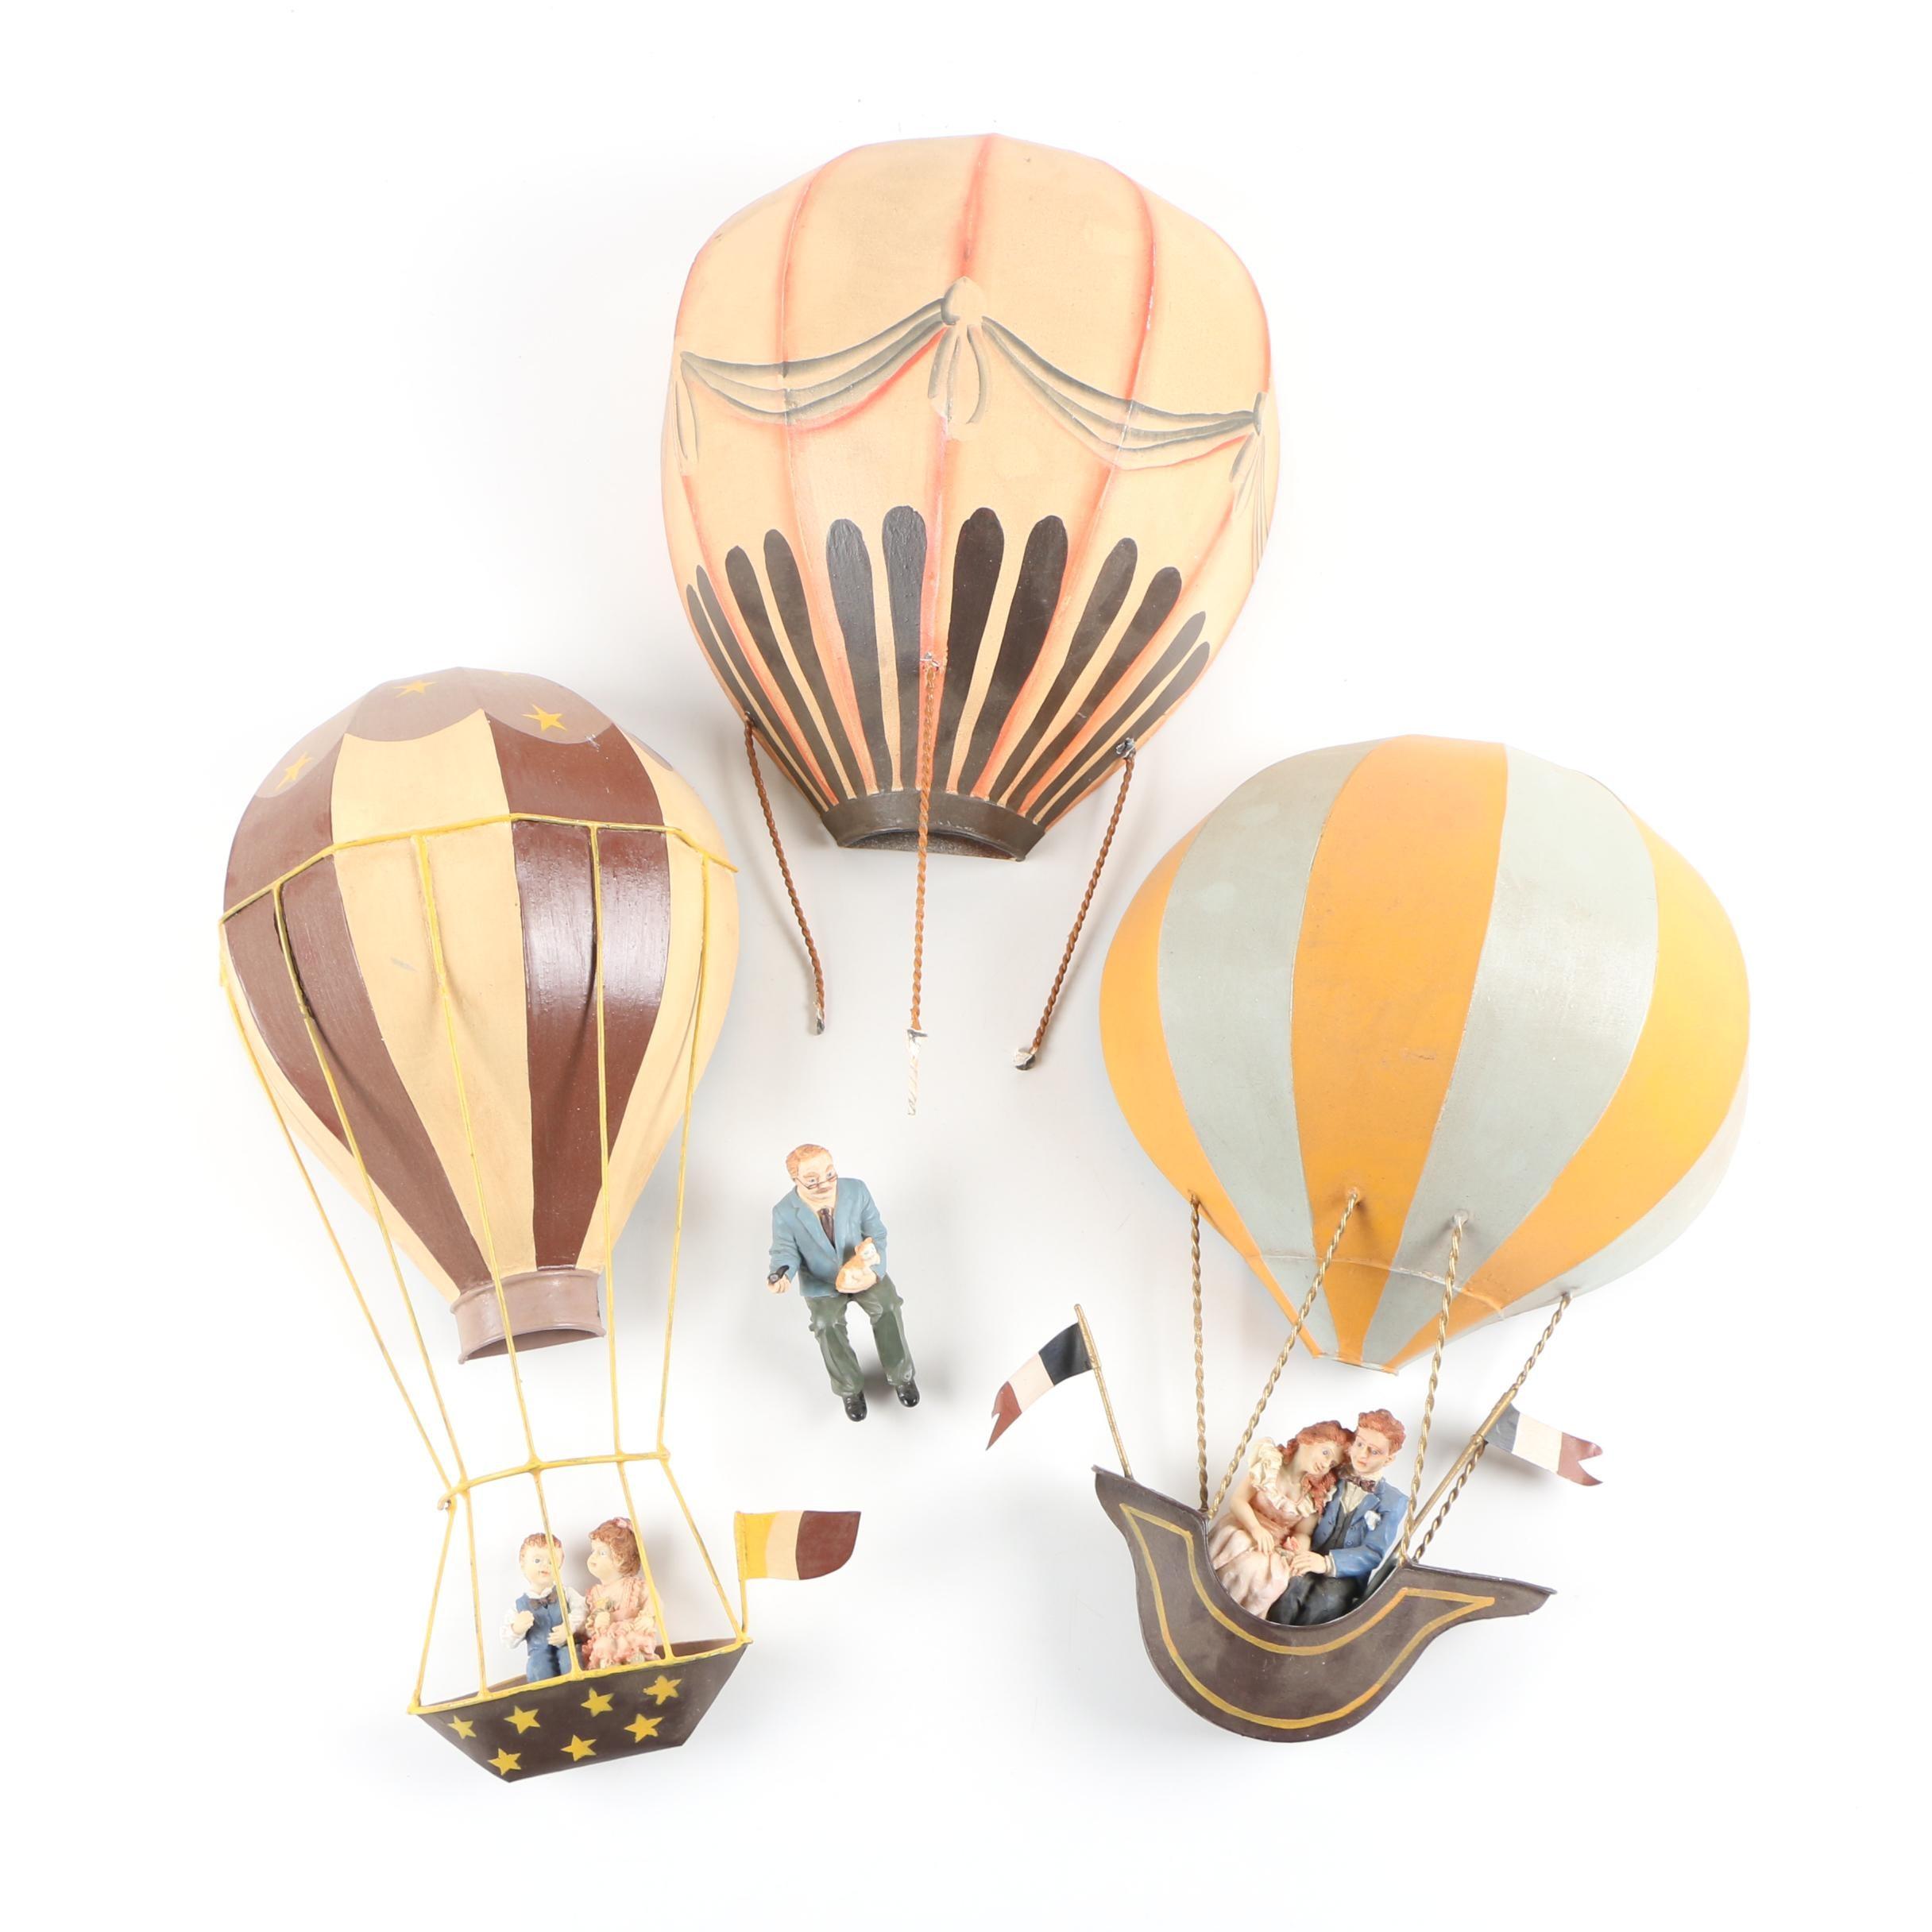 Tole Hot Air Balloon Wall Décor